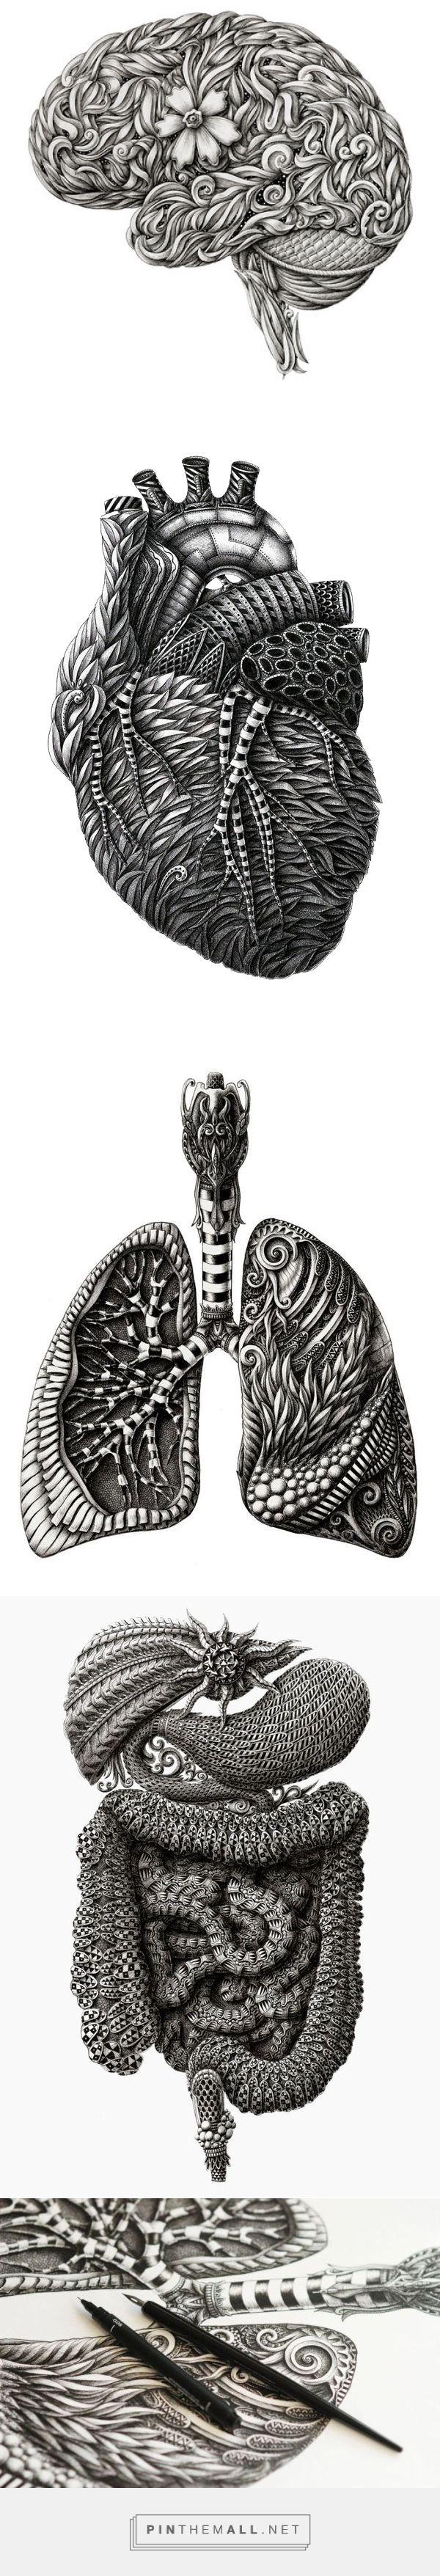 Anatomy (part 1) on Behance